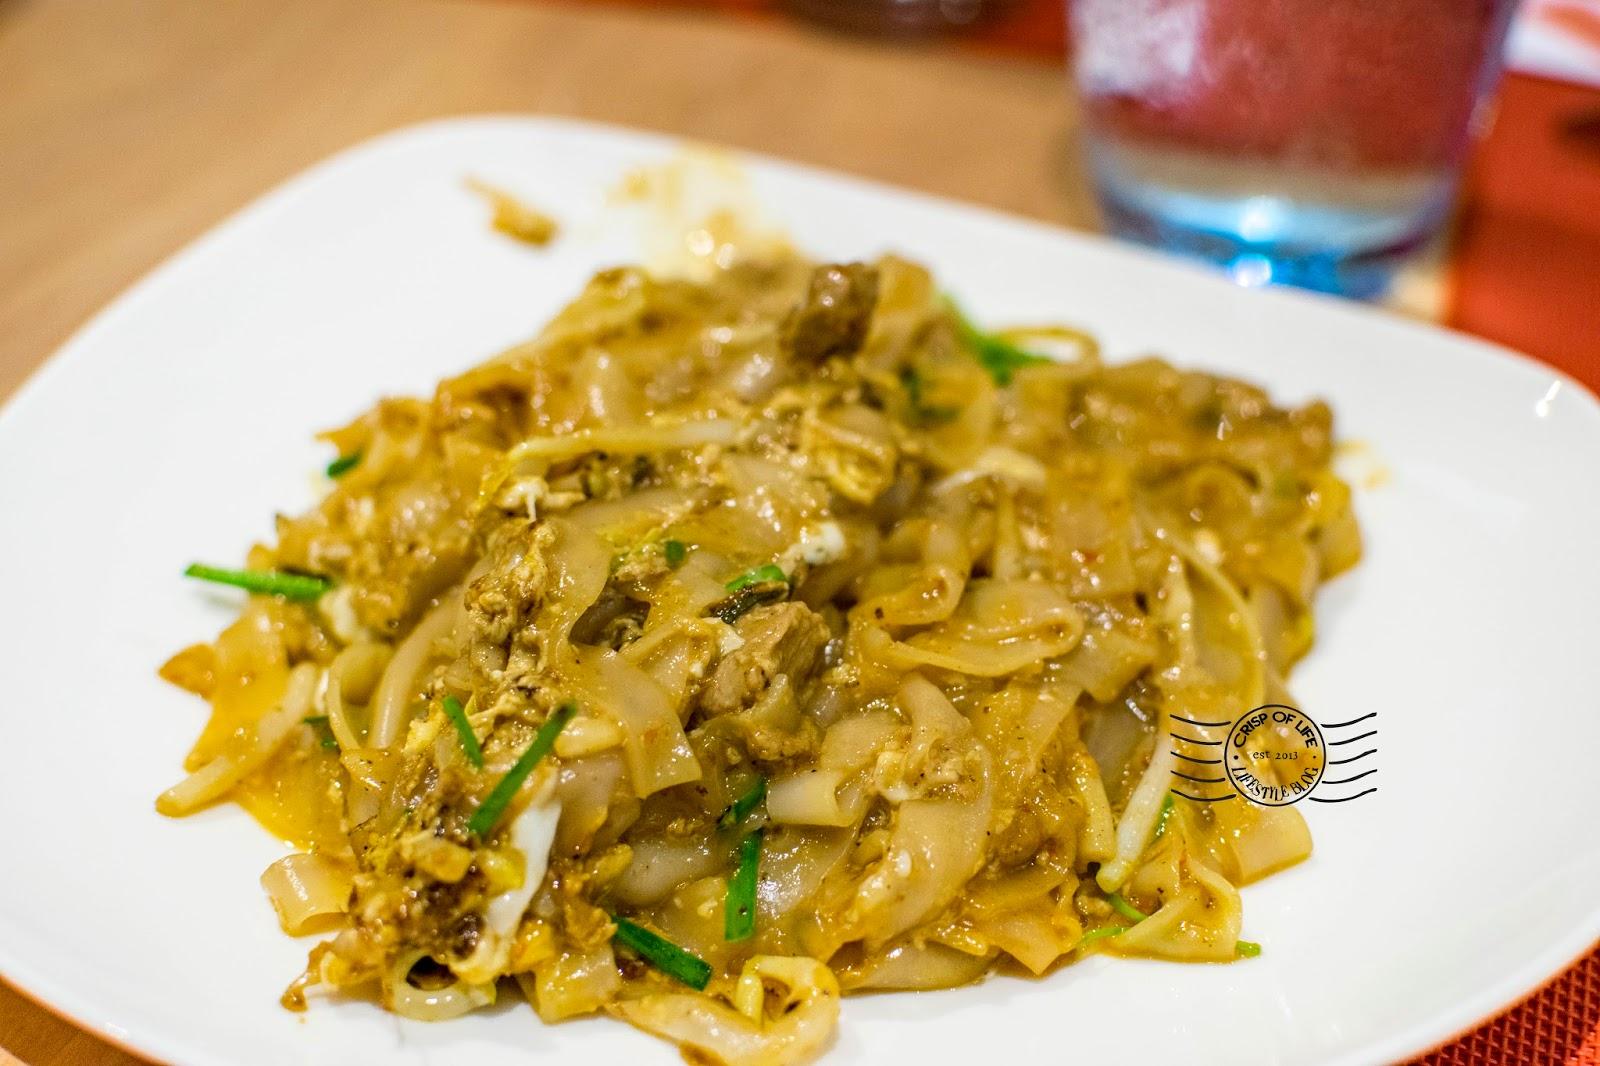 Mai Pi Buka Puasa Ala-Ala Kampung Ramadan Buffet 2017 @ Lexis Suites Penang